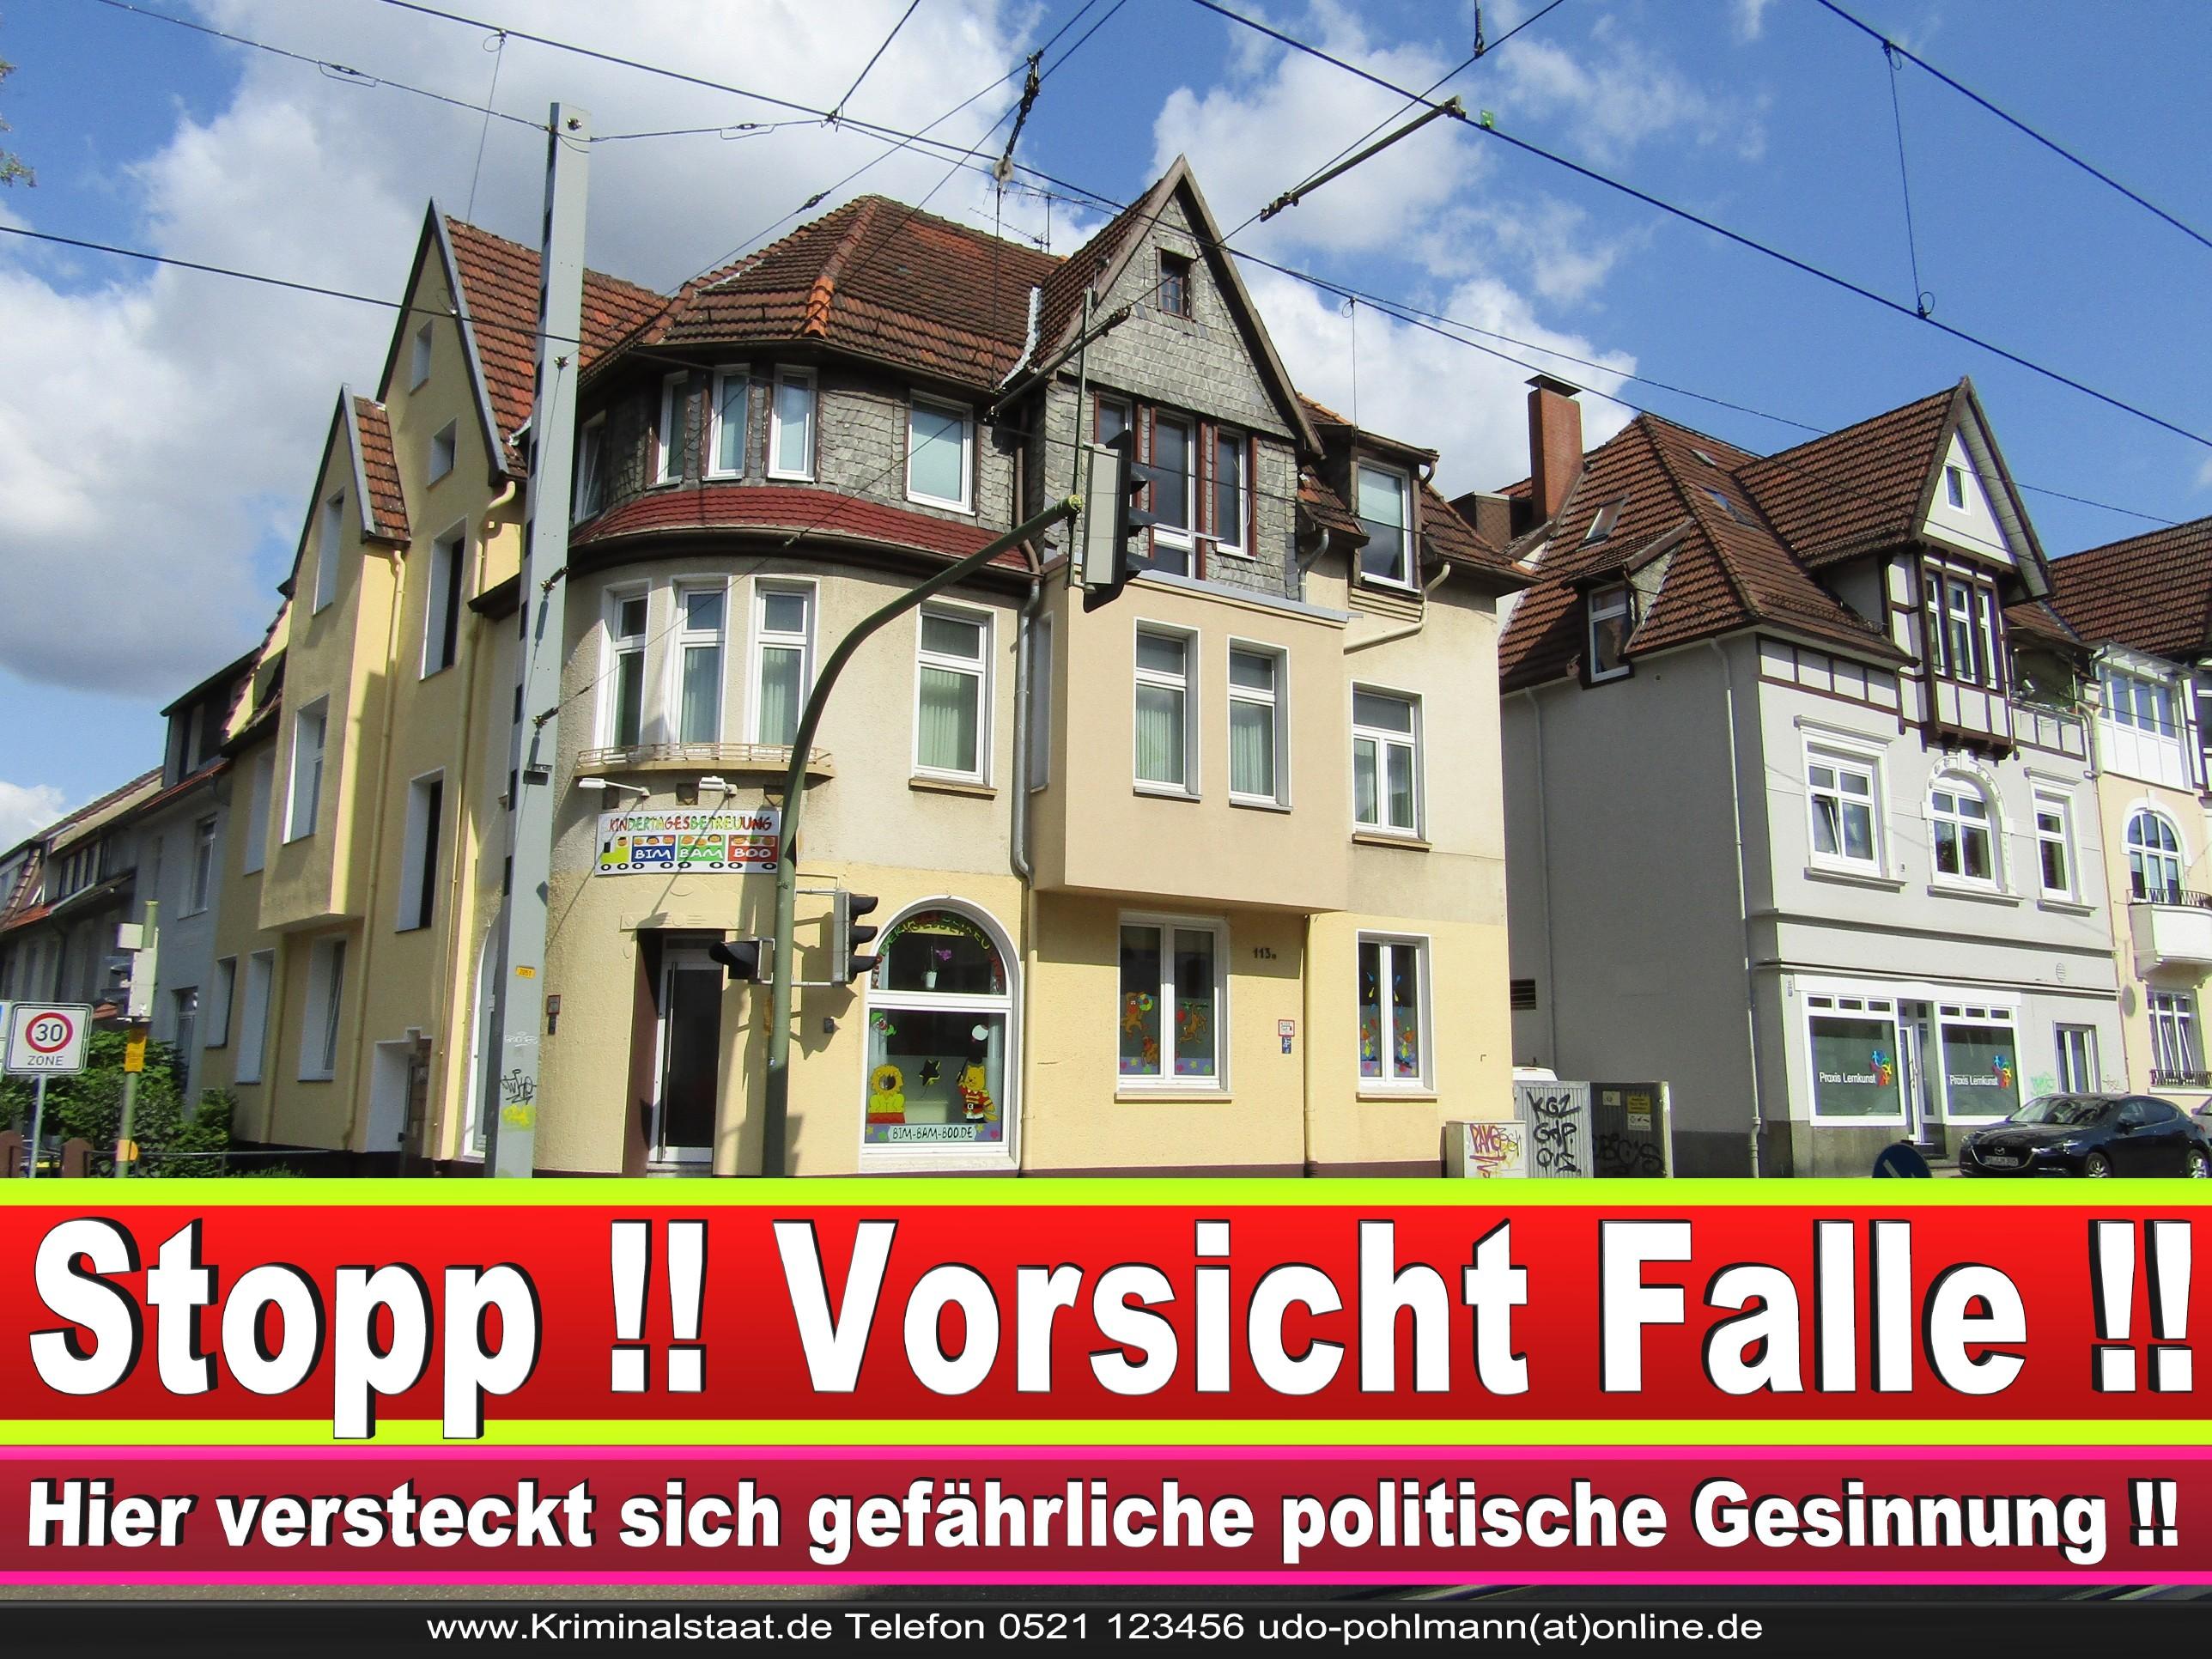 WILLI BLUMENSAAT CDU BIELEFELD 2 LANDTAGSWAHL BUNDESTAGSWAHL BÜRGERMEISTERWAHL